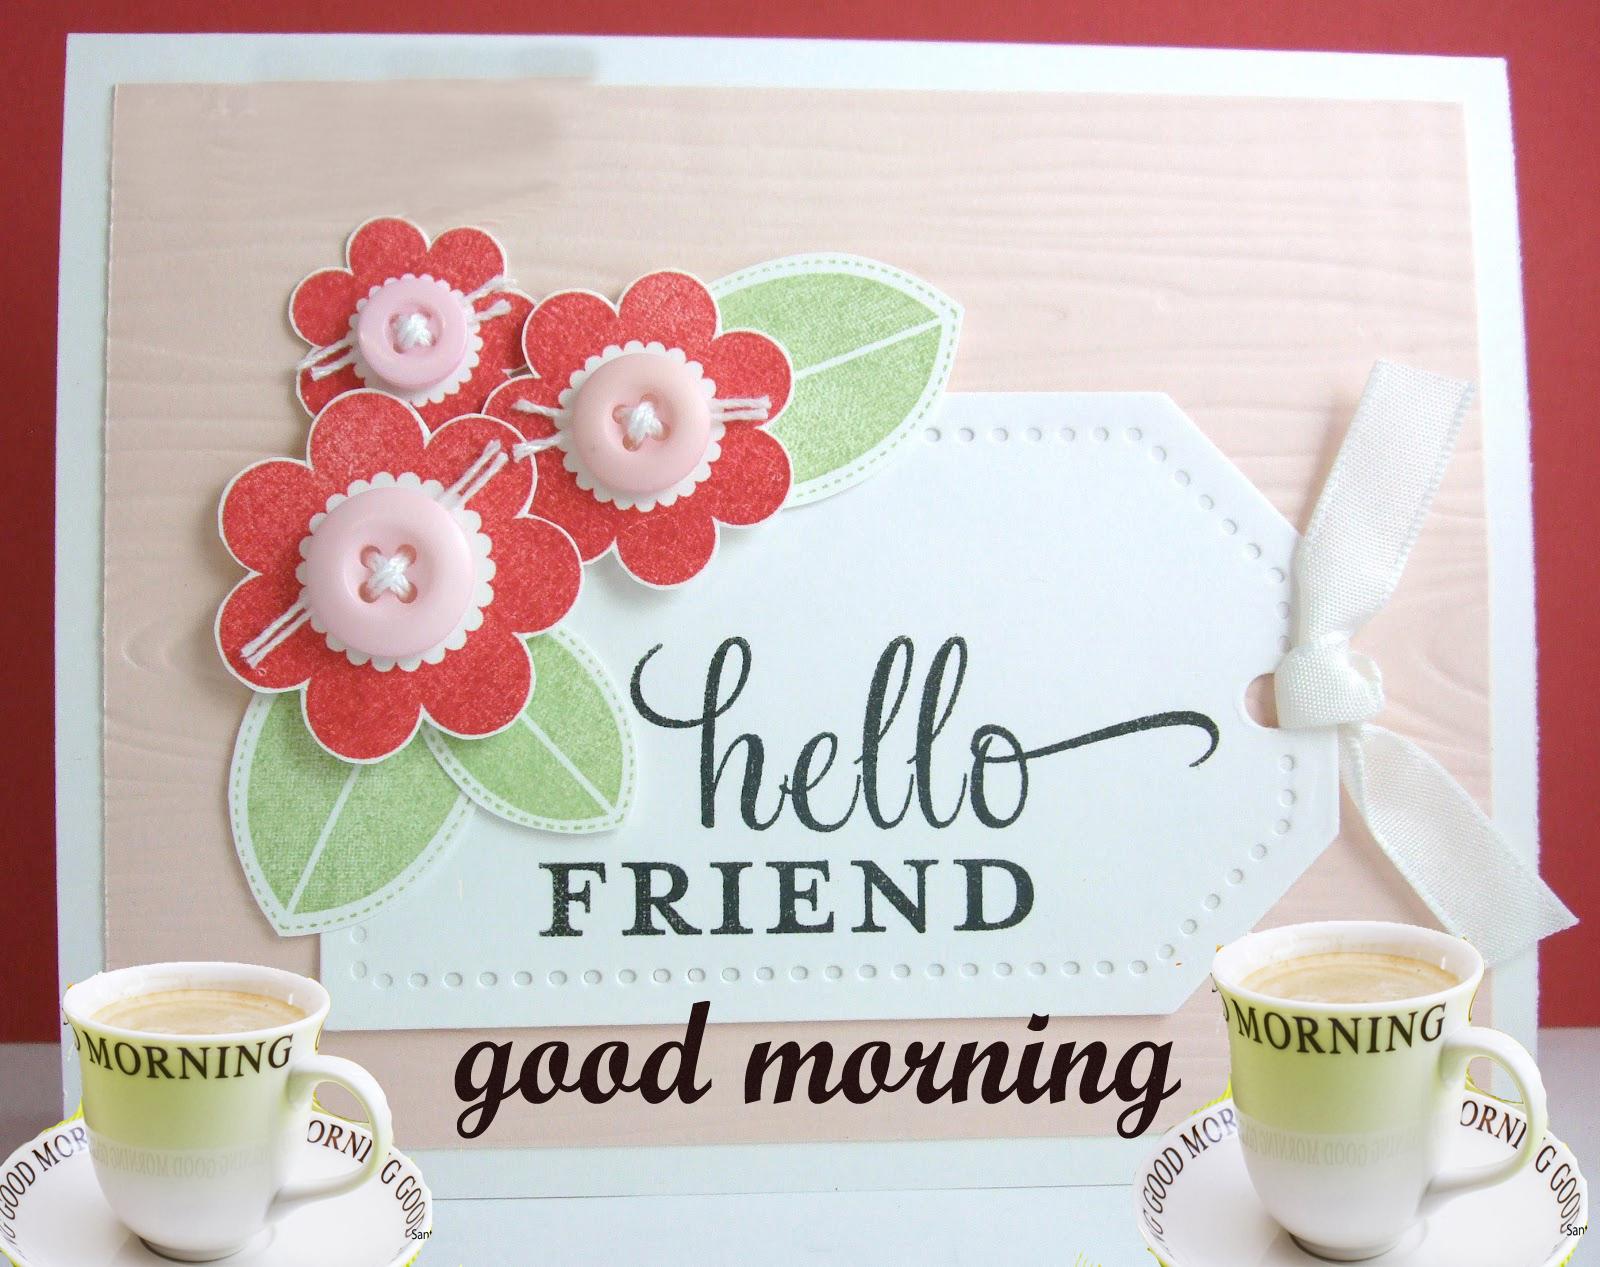 Good Morning HD Wallpapers